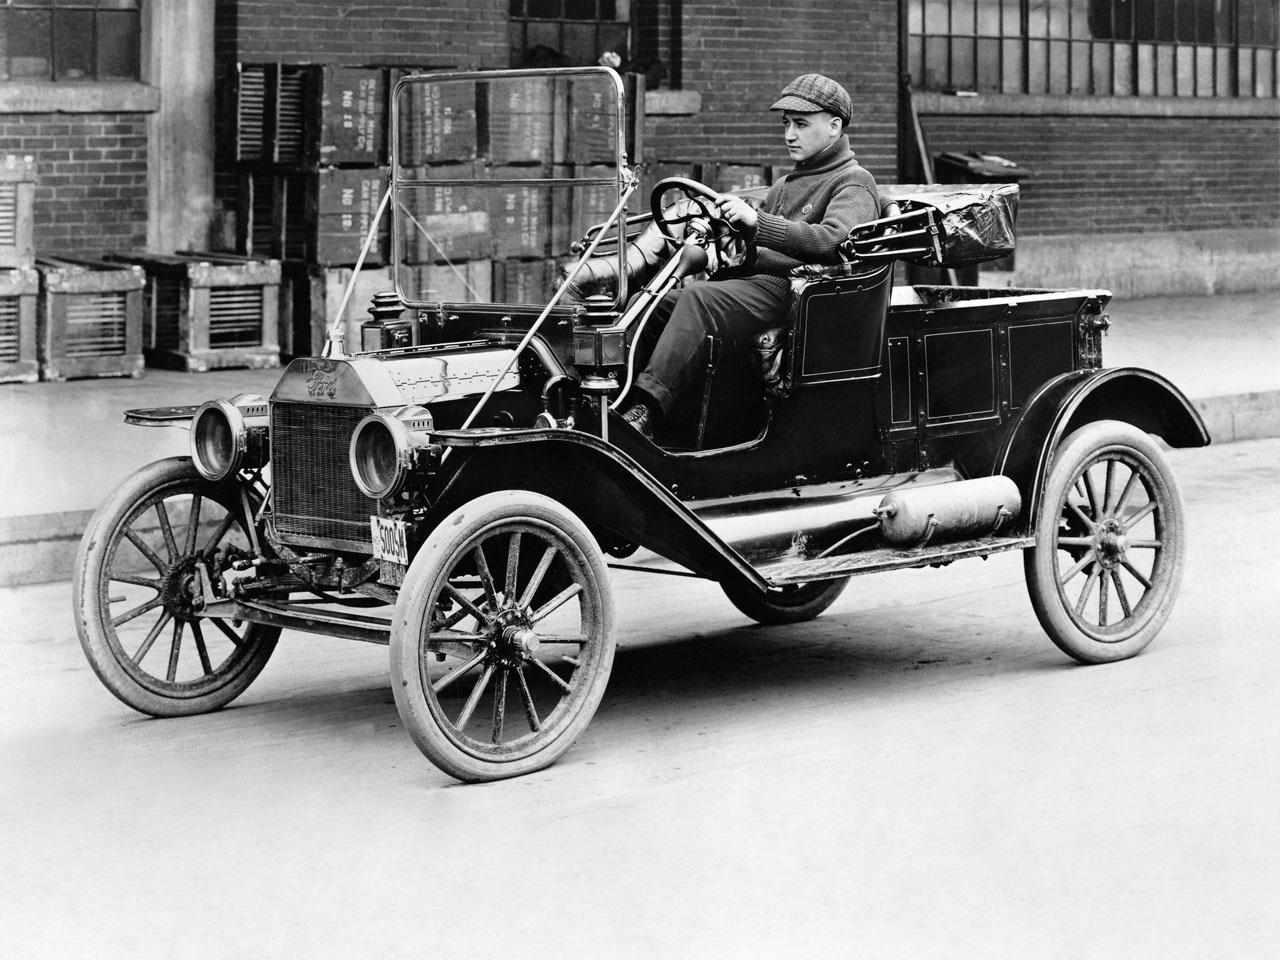 Генри Форд. История создания автомобиля марки Ford